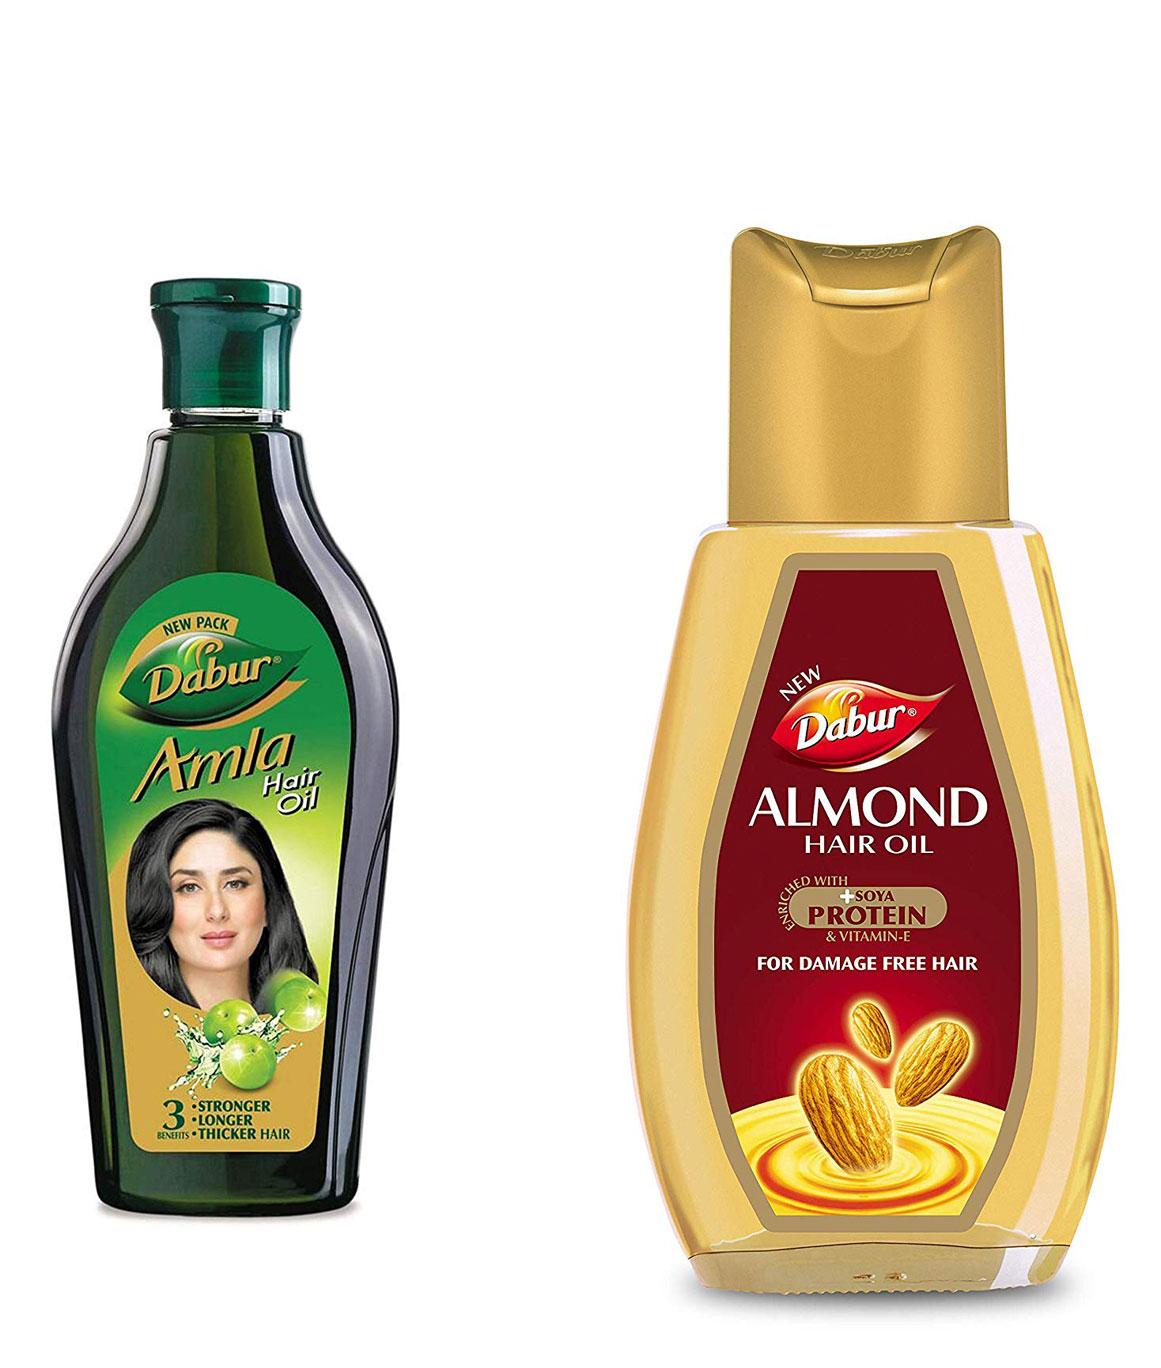 Dabur Amla Hair Oil 450ml and Dabur Almond Hair Oil 500ml Combo Pack